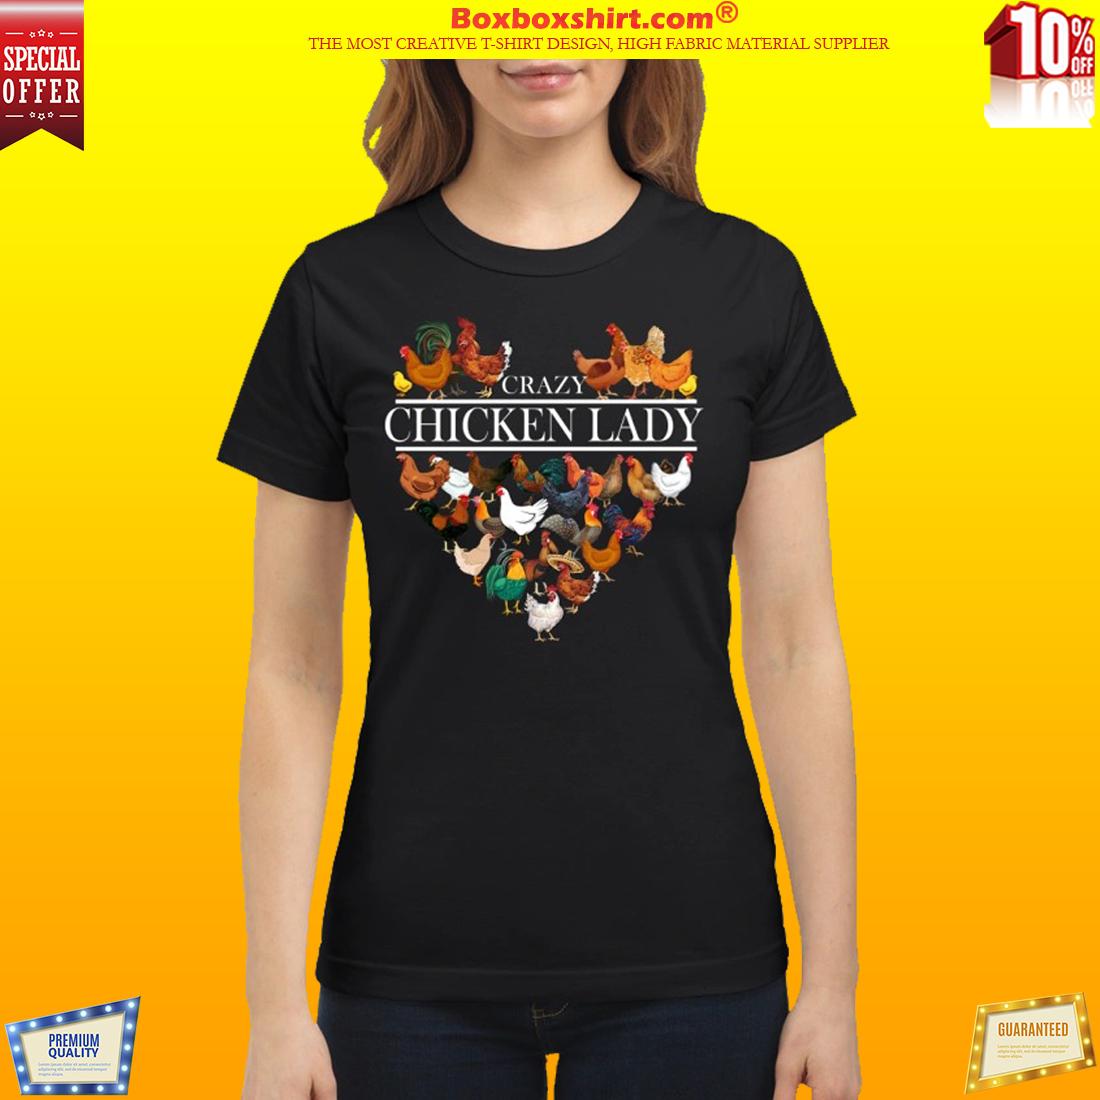 Heart crazy chicken lady shirt